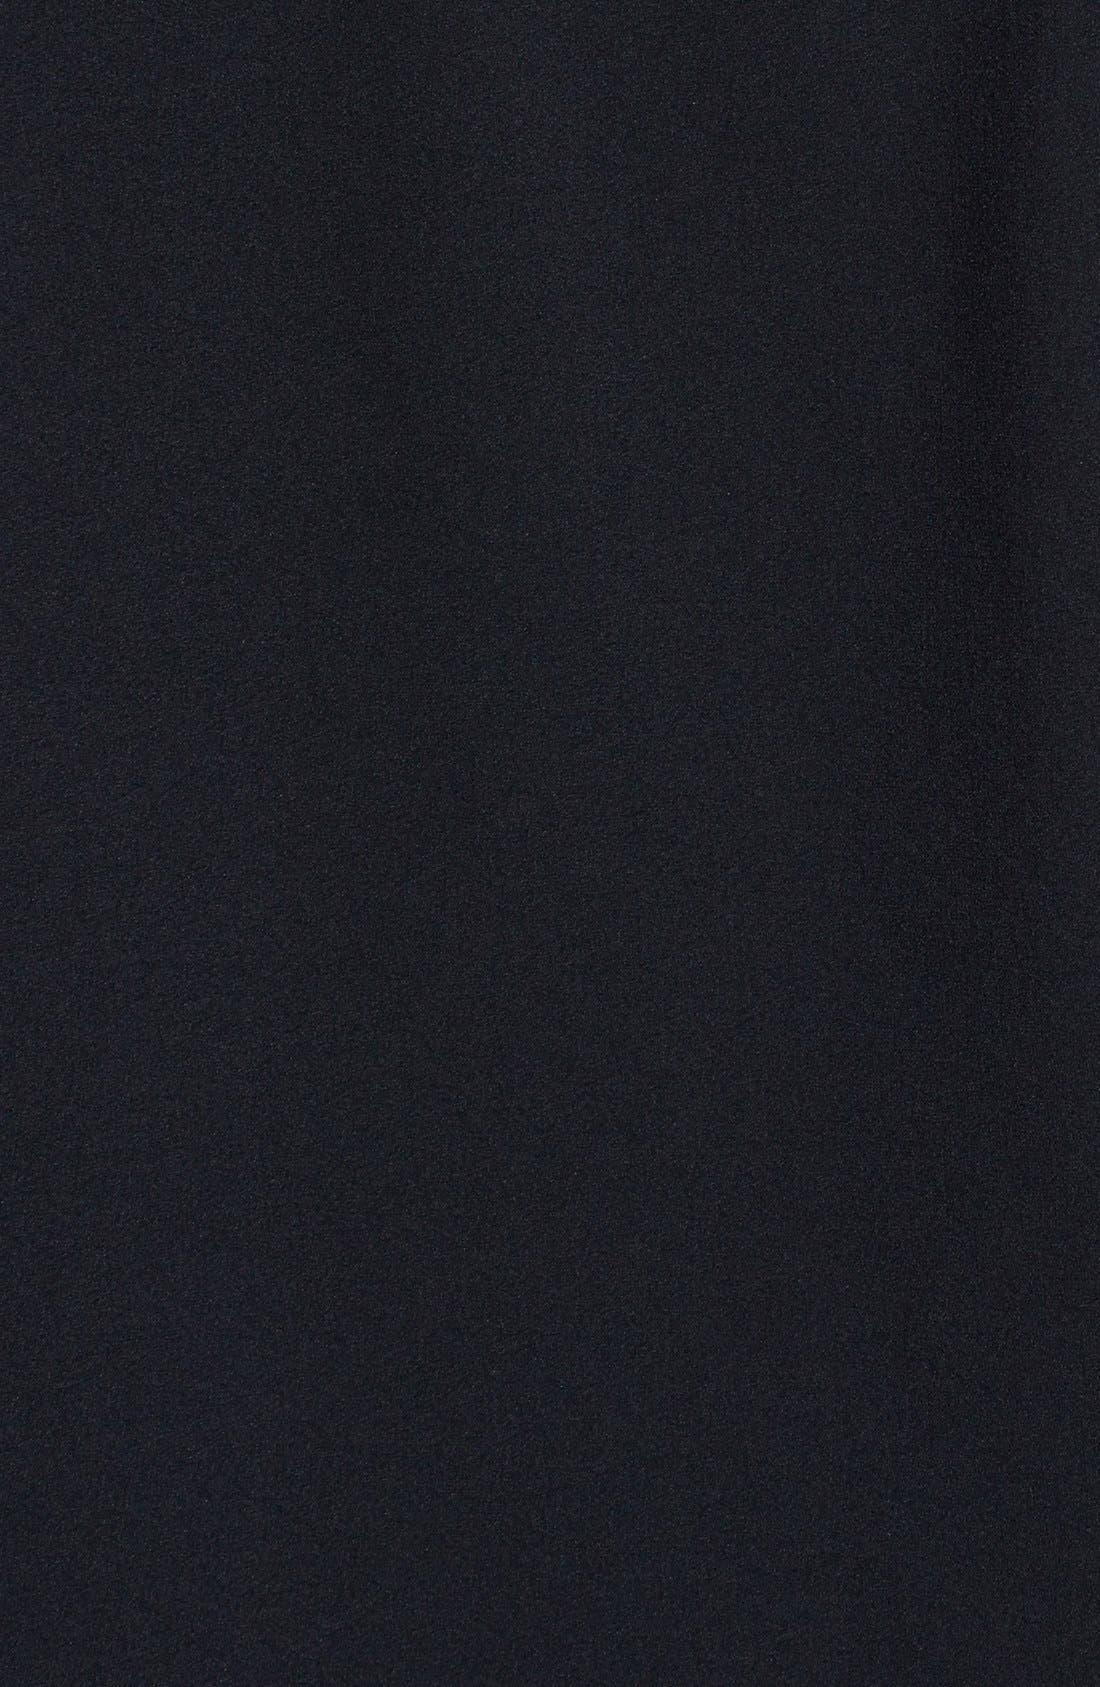 Alternate Image 3  - The North Face 'Nimble' Wind Resistant Vest